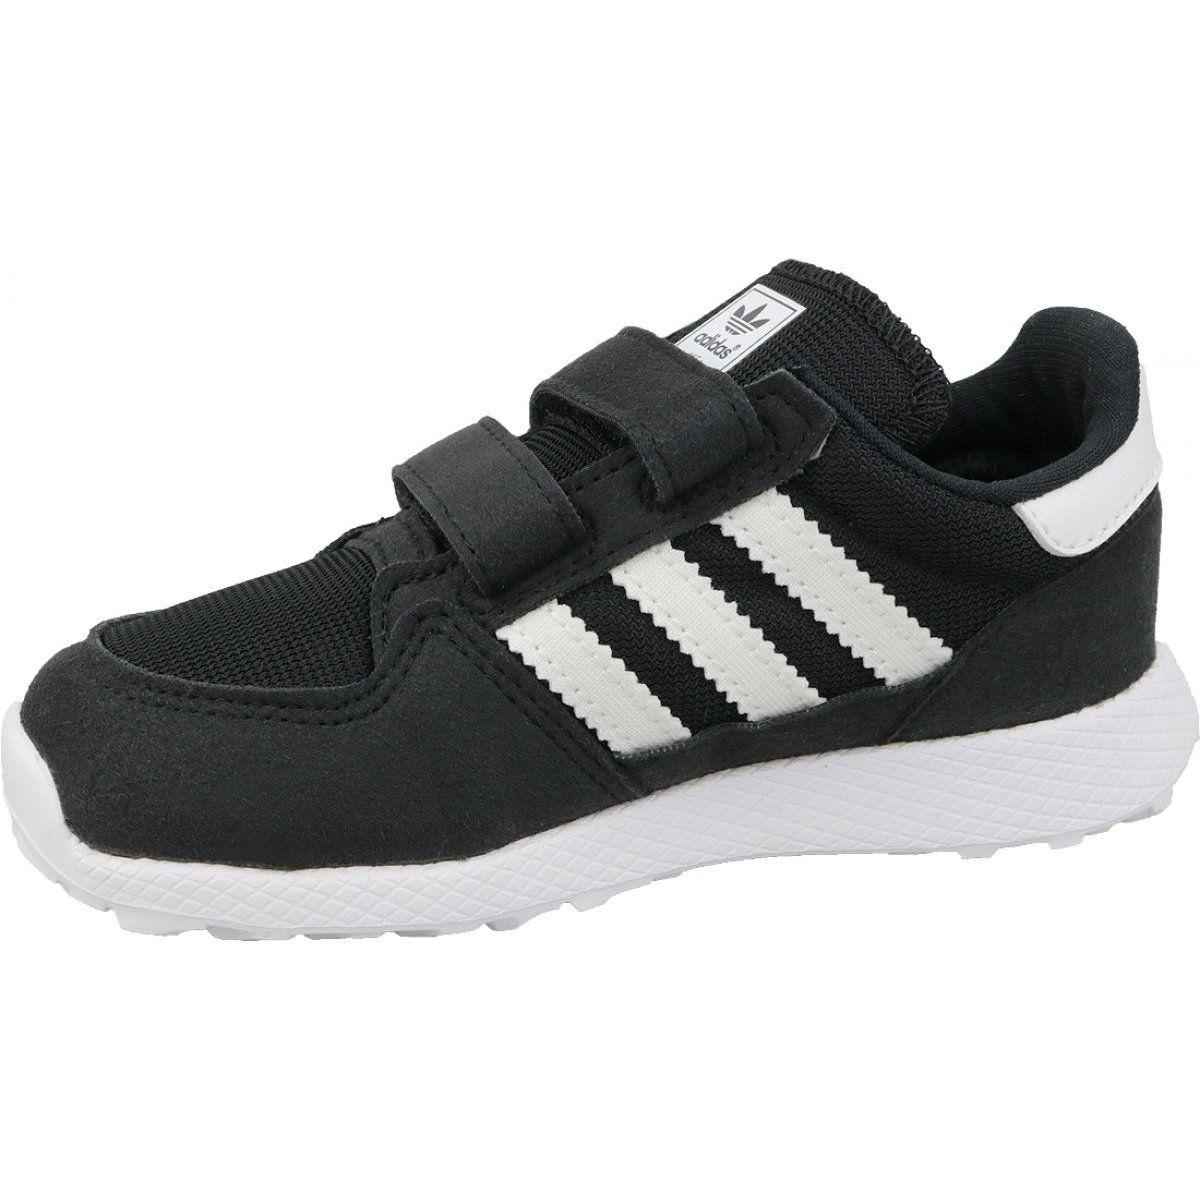 Buty Adidas Originals Forest Grove Cf Jr B37749 Czarne Sports Shoes Adidas Adidas Originals Black Shoes